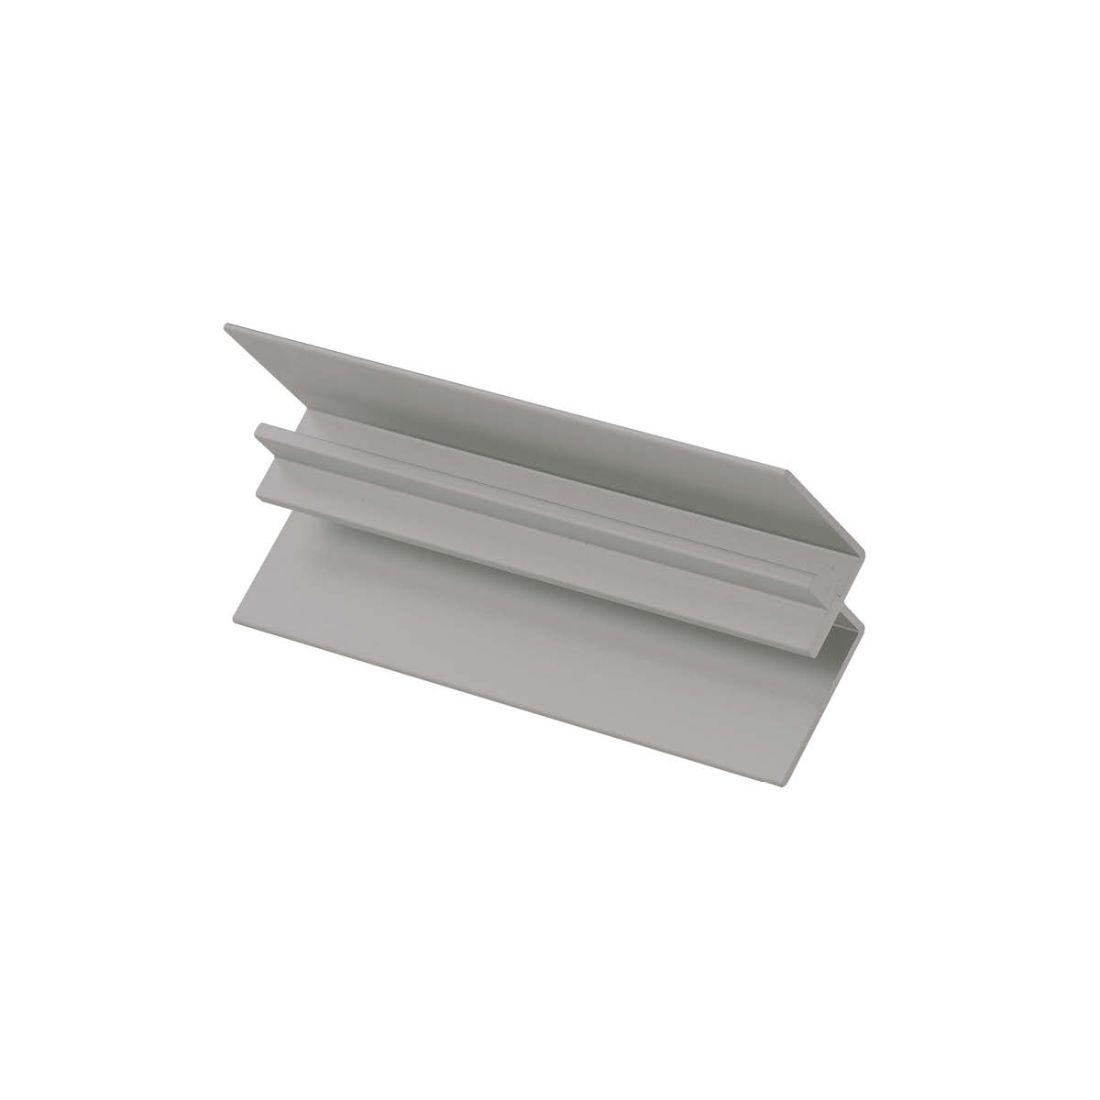 Aluminium Internal Corner Jointer Sandy Bay 2700 x 4.5mm